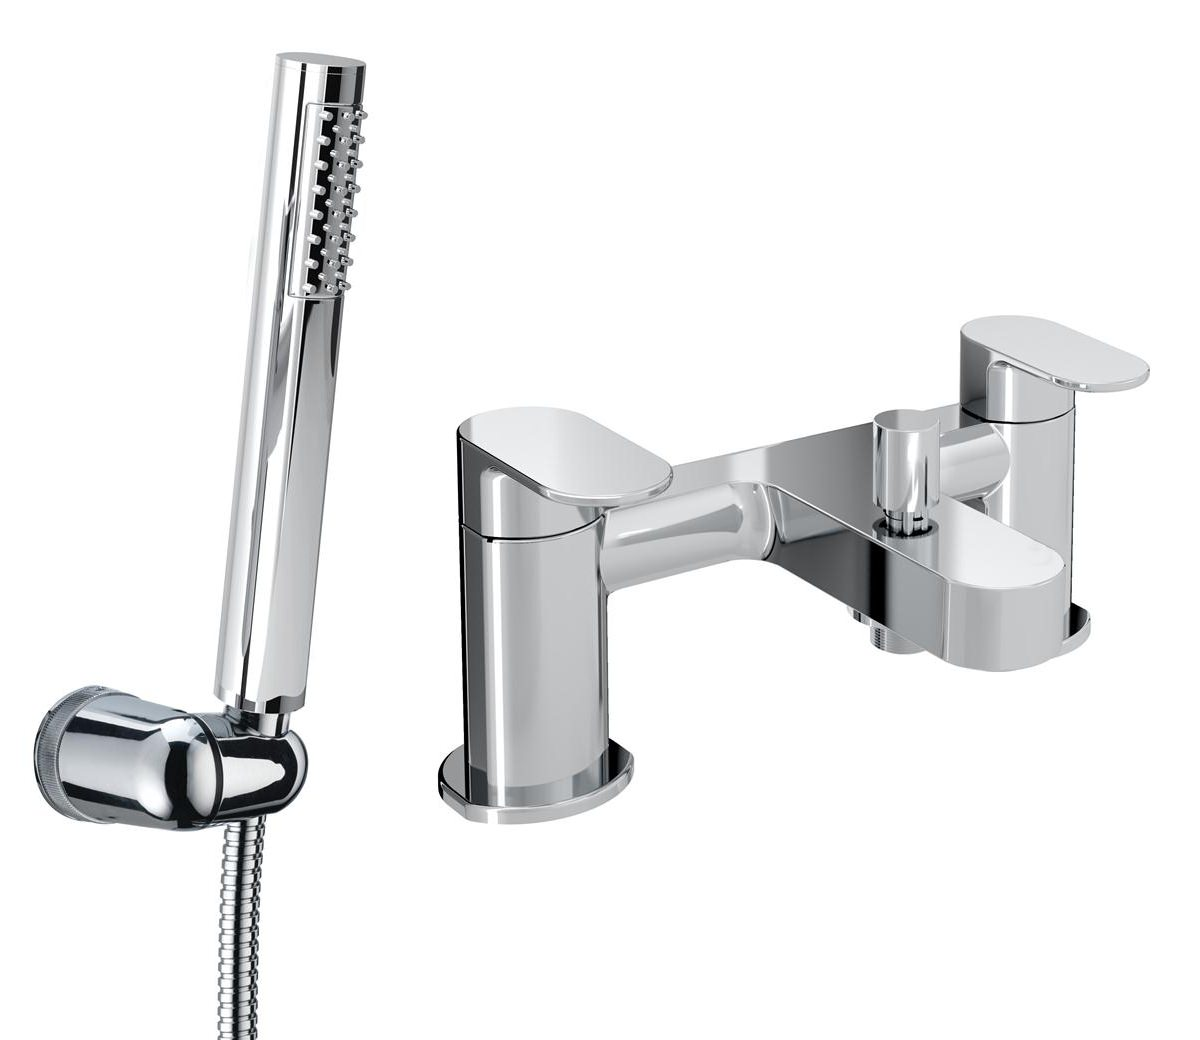 Deck Mounted Bath Shower Mixer Bristan